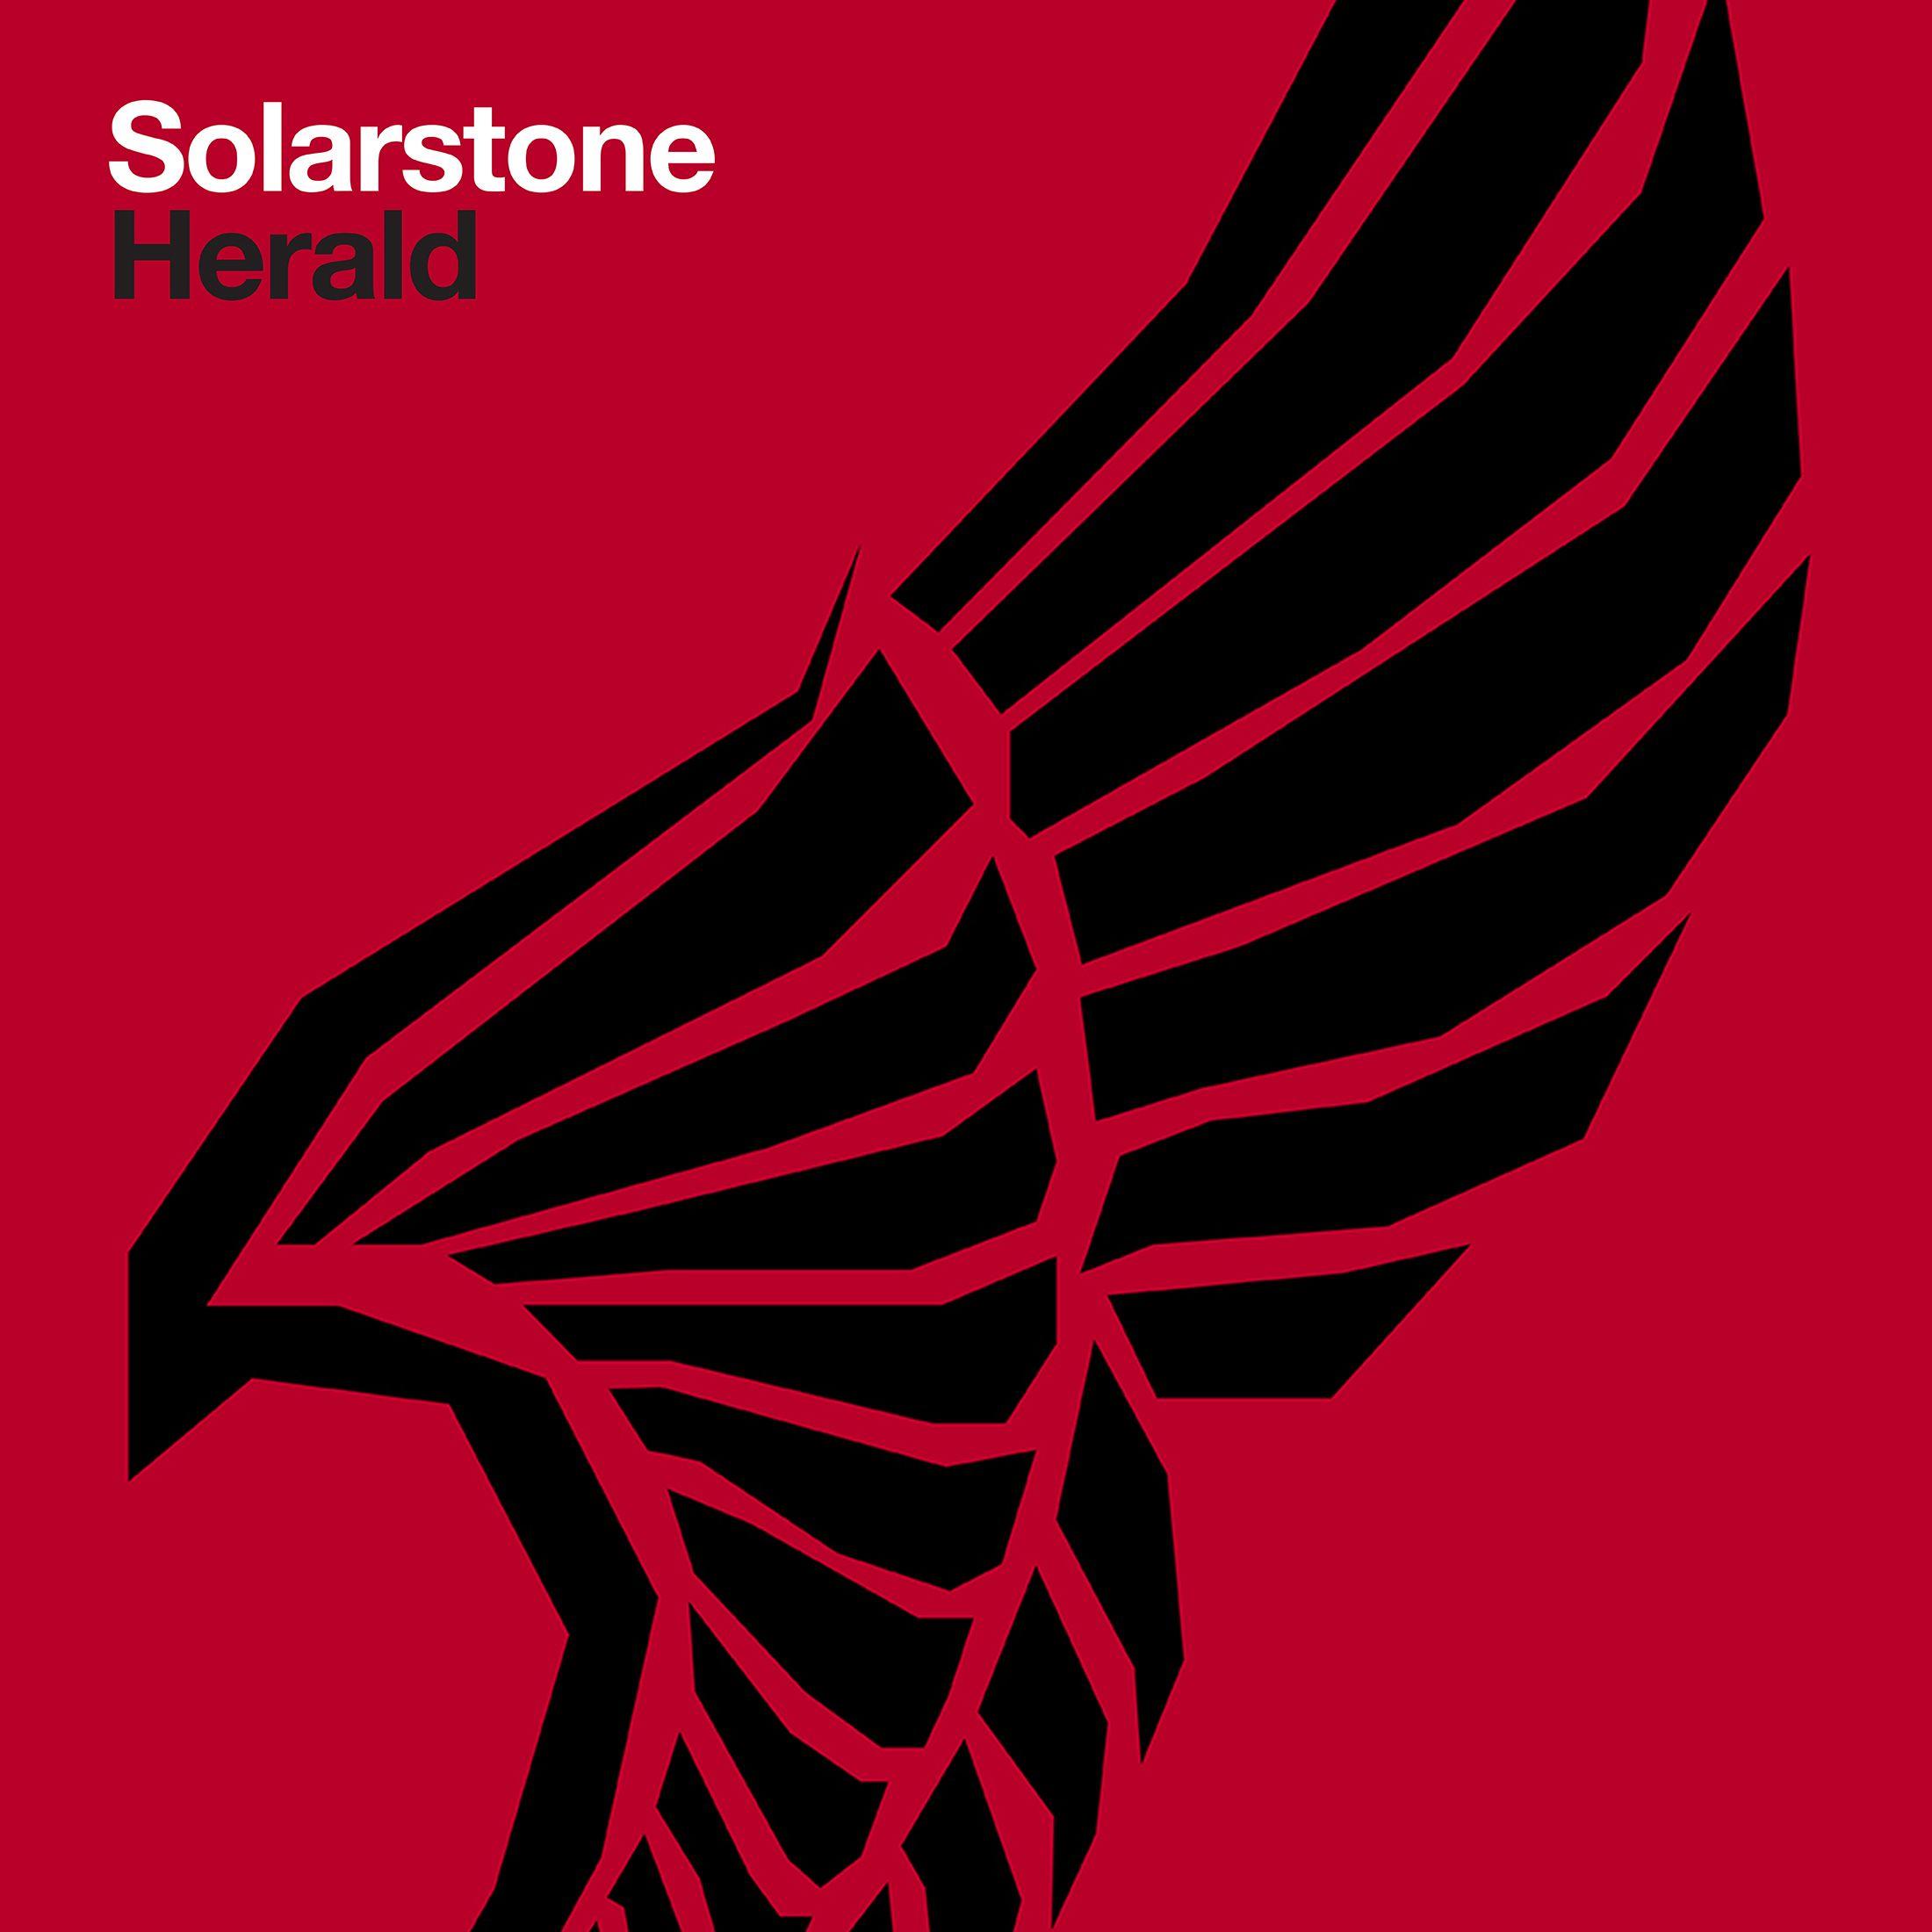 solarstone_-_herald.jpg